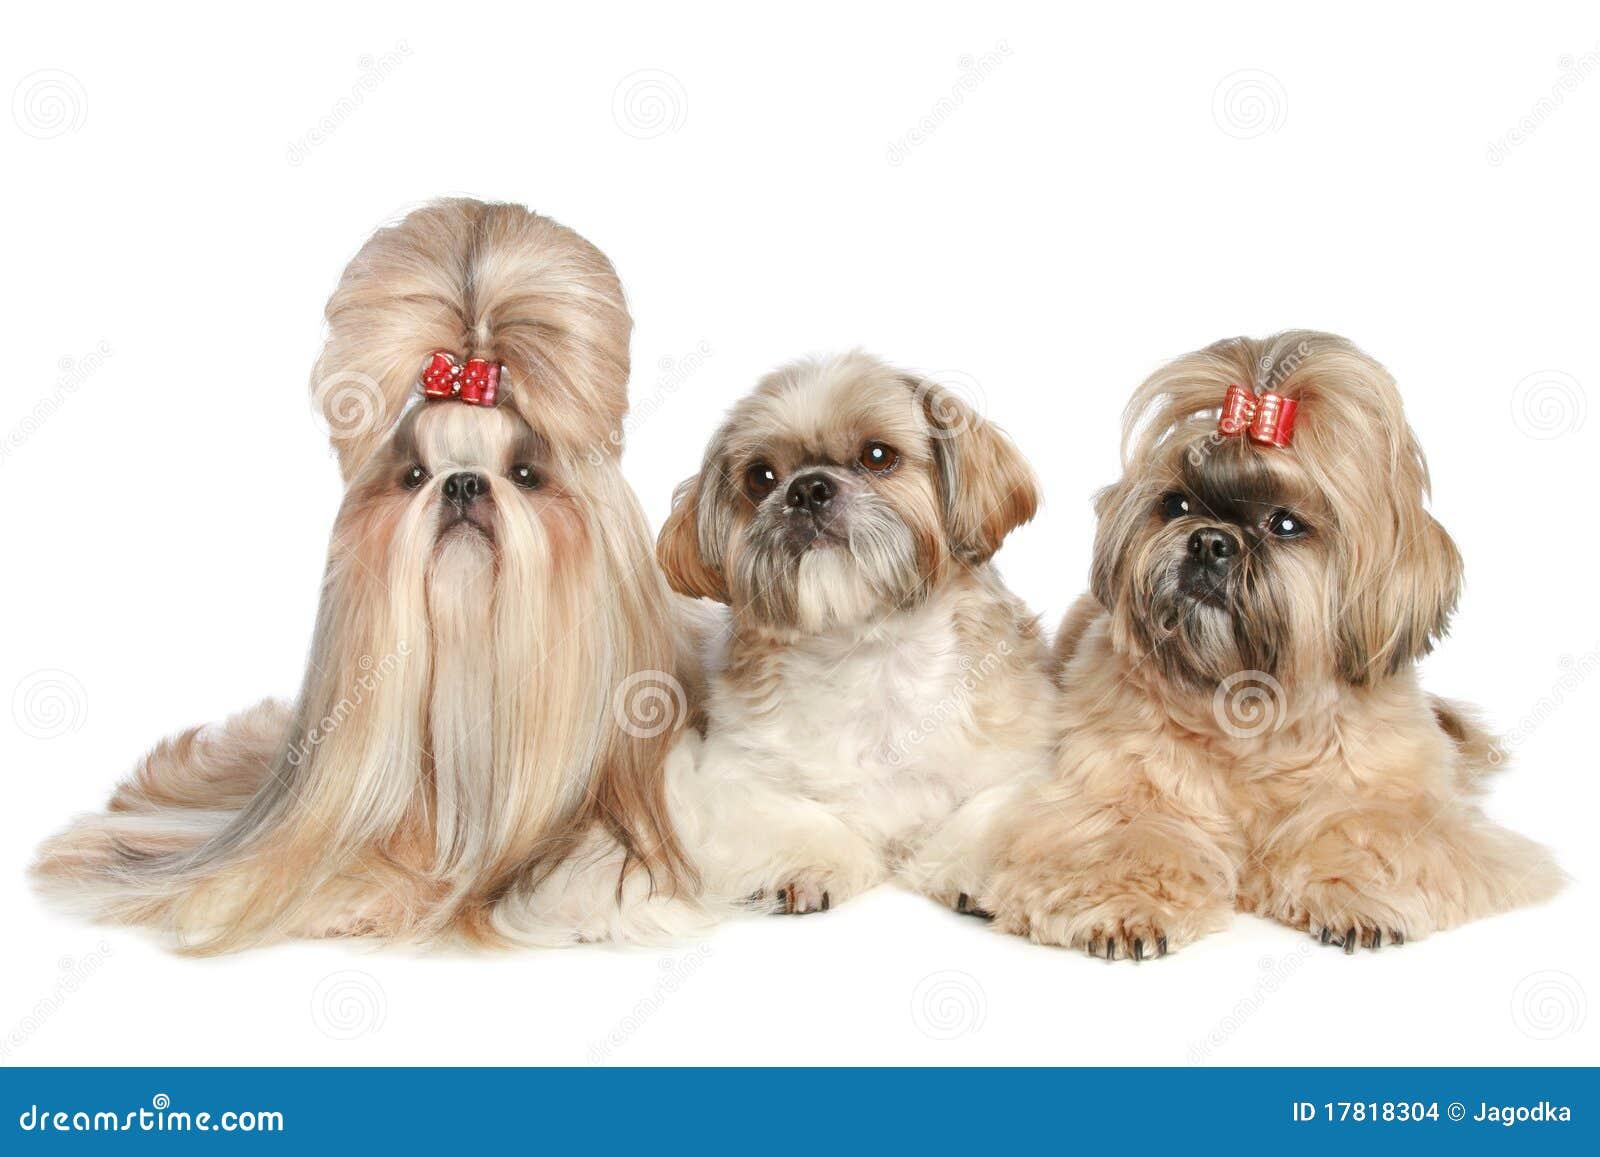 Three dogs Shih tzu lie on a white background